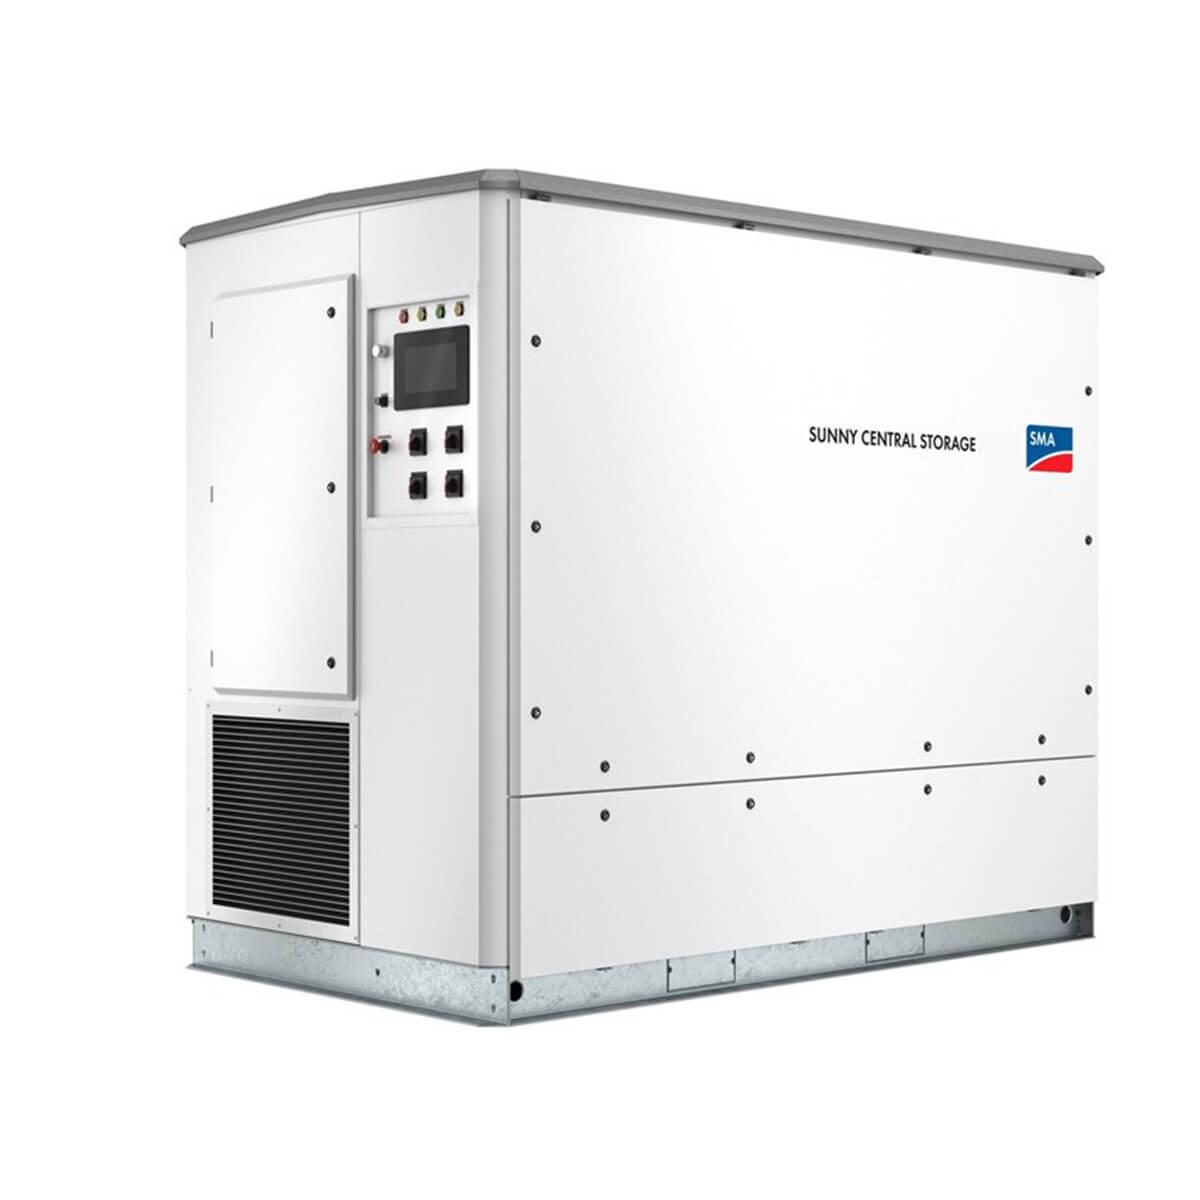 sma 2500kW inverter, sma sunny central 2500kW inverter, sma sunny central 2500-ev inverter, sma sunny central 2500-ev, sma sunny central 2500 kW